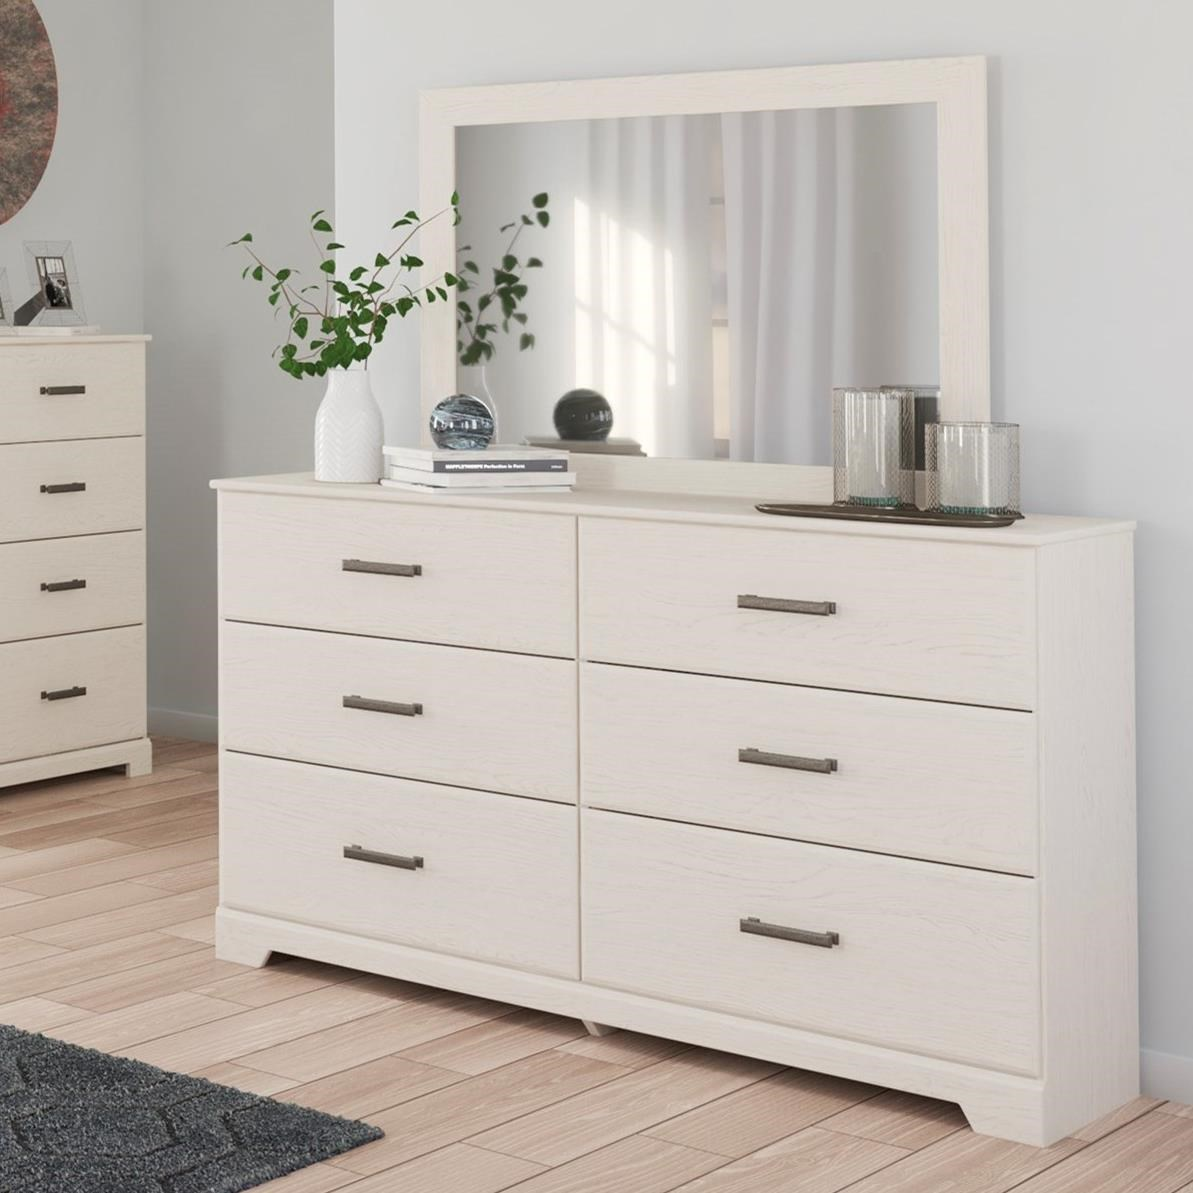 Stelsie Dresser & Bedroom Mirror by Signature Design by Ashley at Standard Furniture